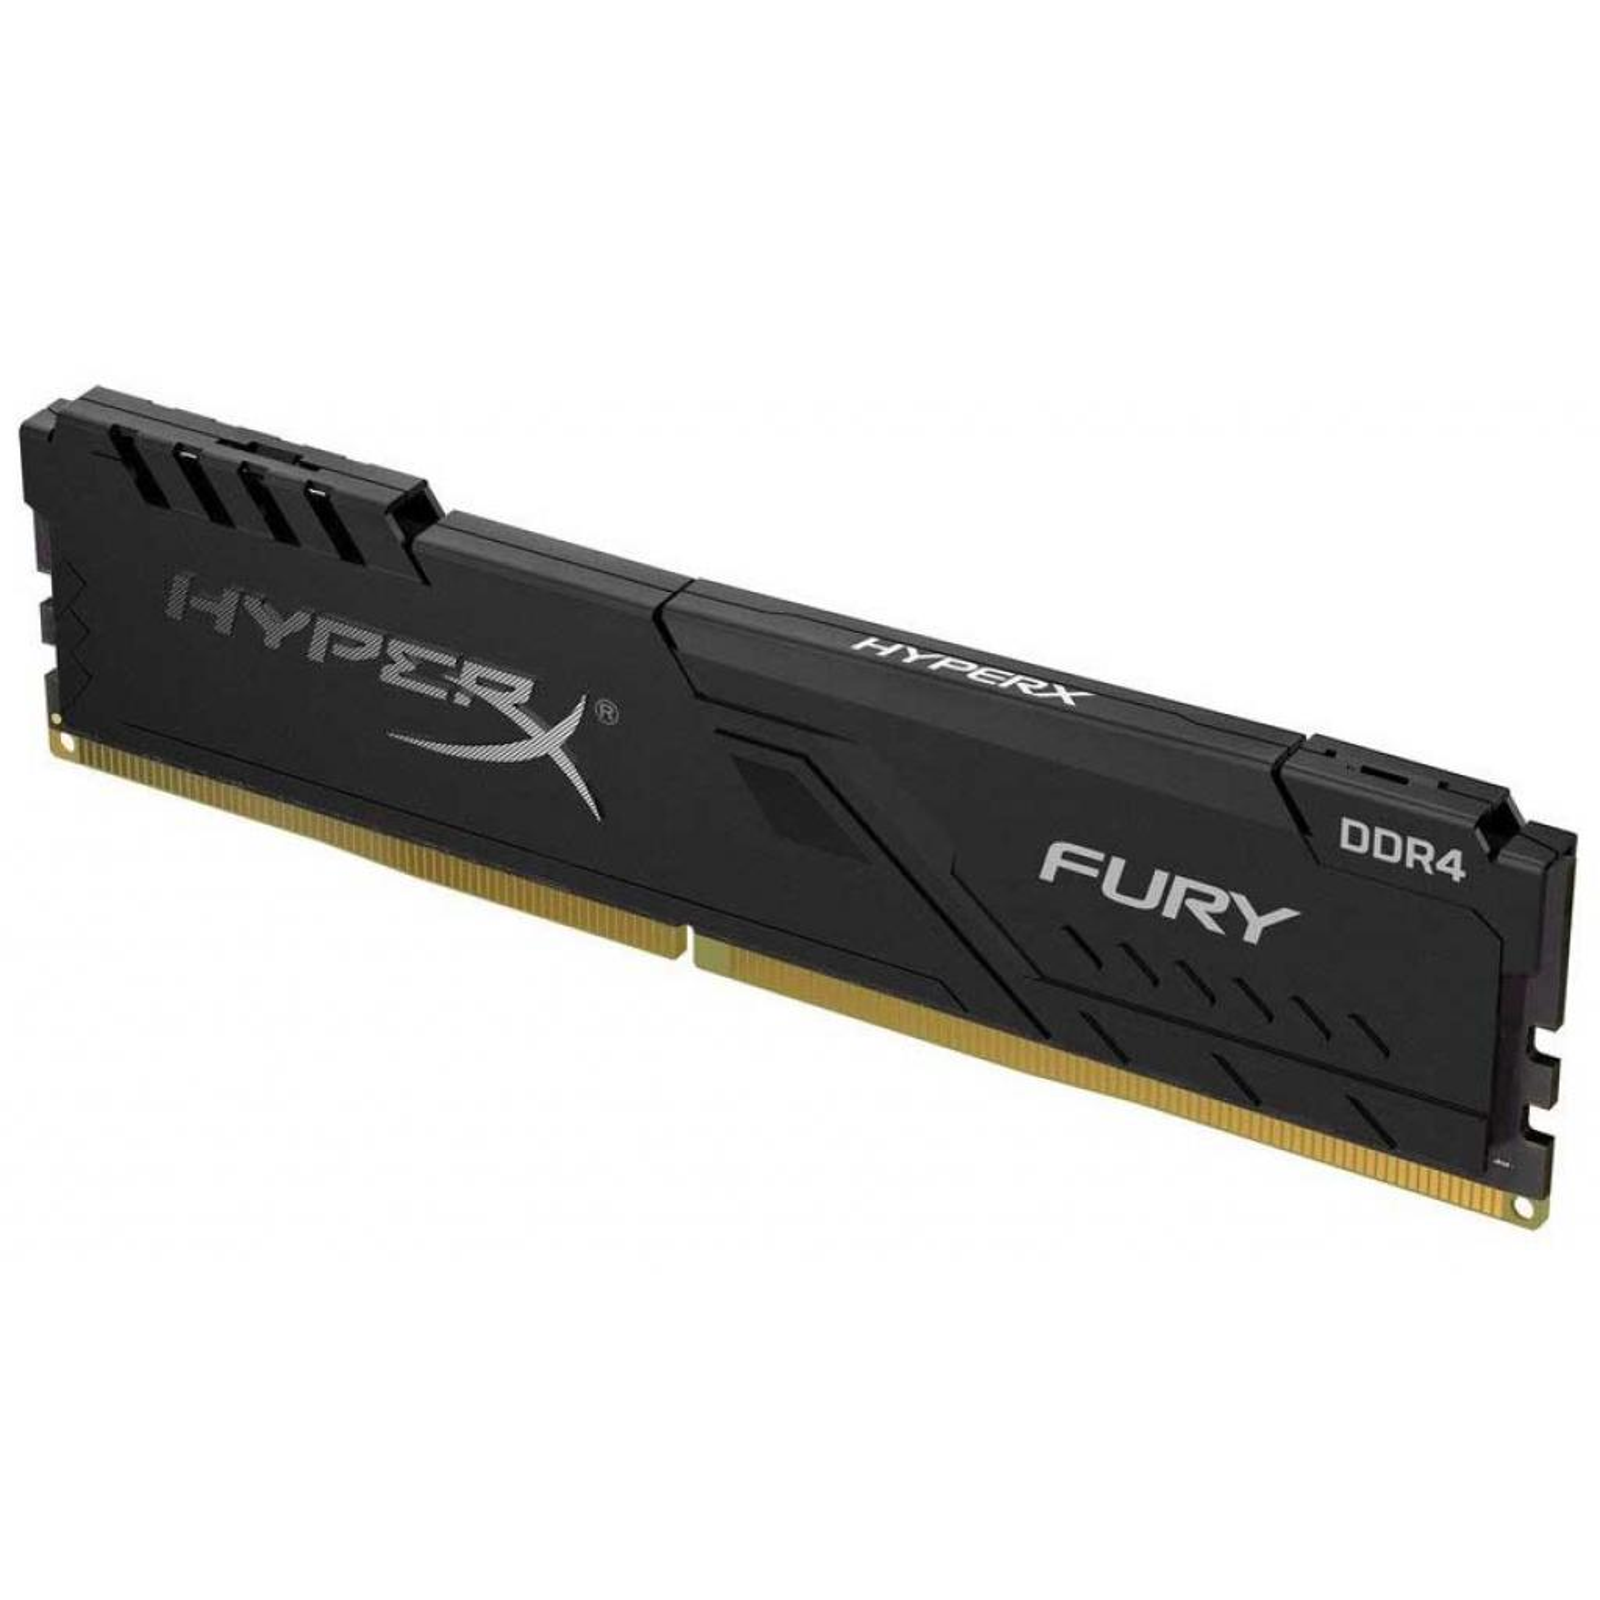 Модуль памяти для компьютера DDR4 16GB 2400 MHz HyperX FURY Black HyperX (Kingston Fury) (HX424C15FB3/16) изображение 3